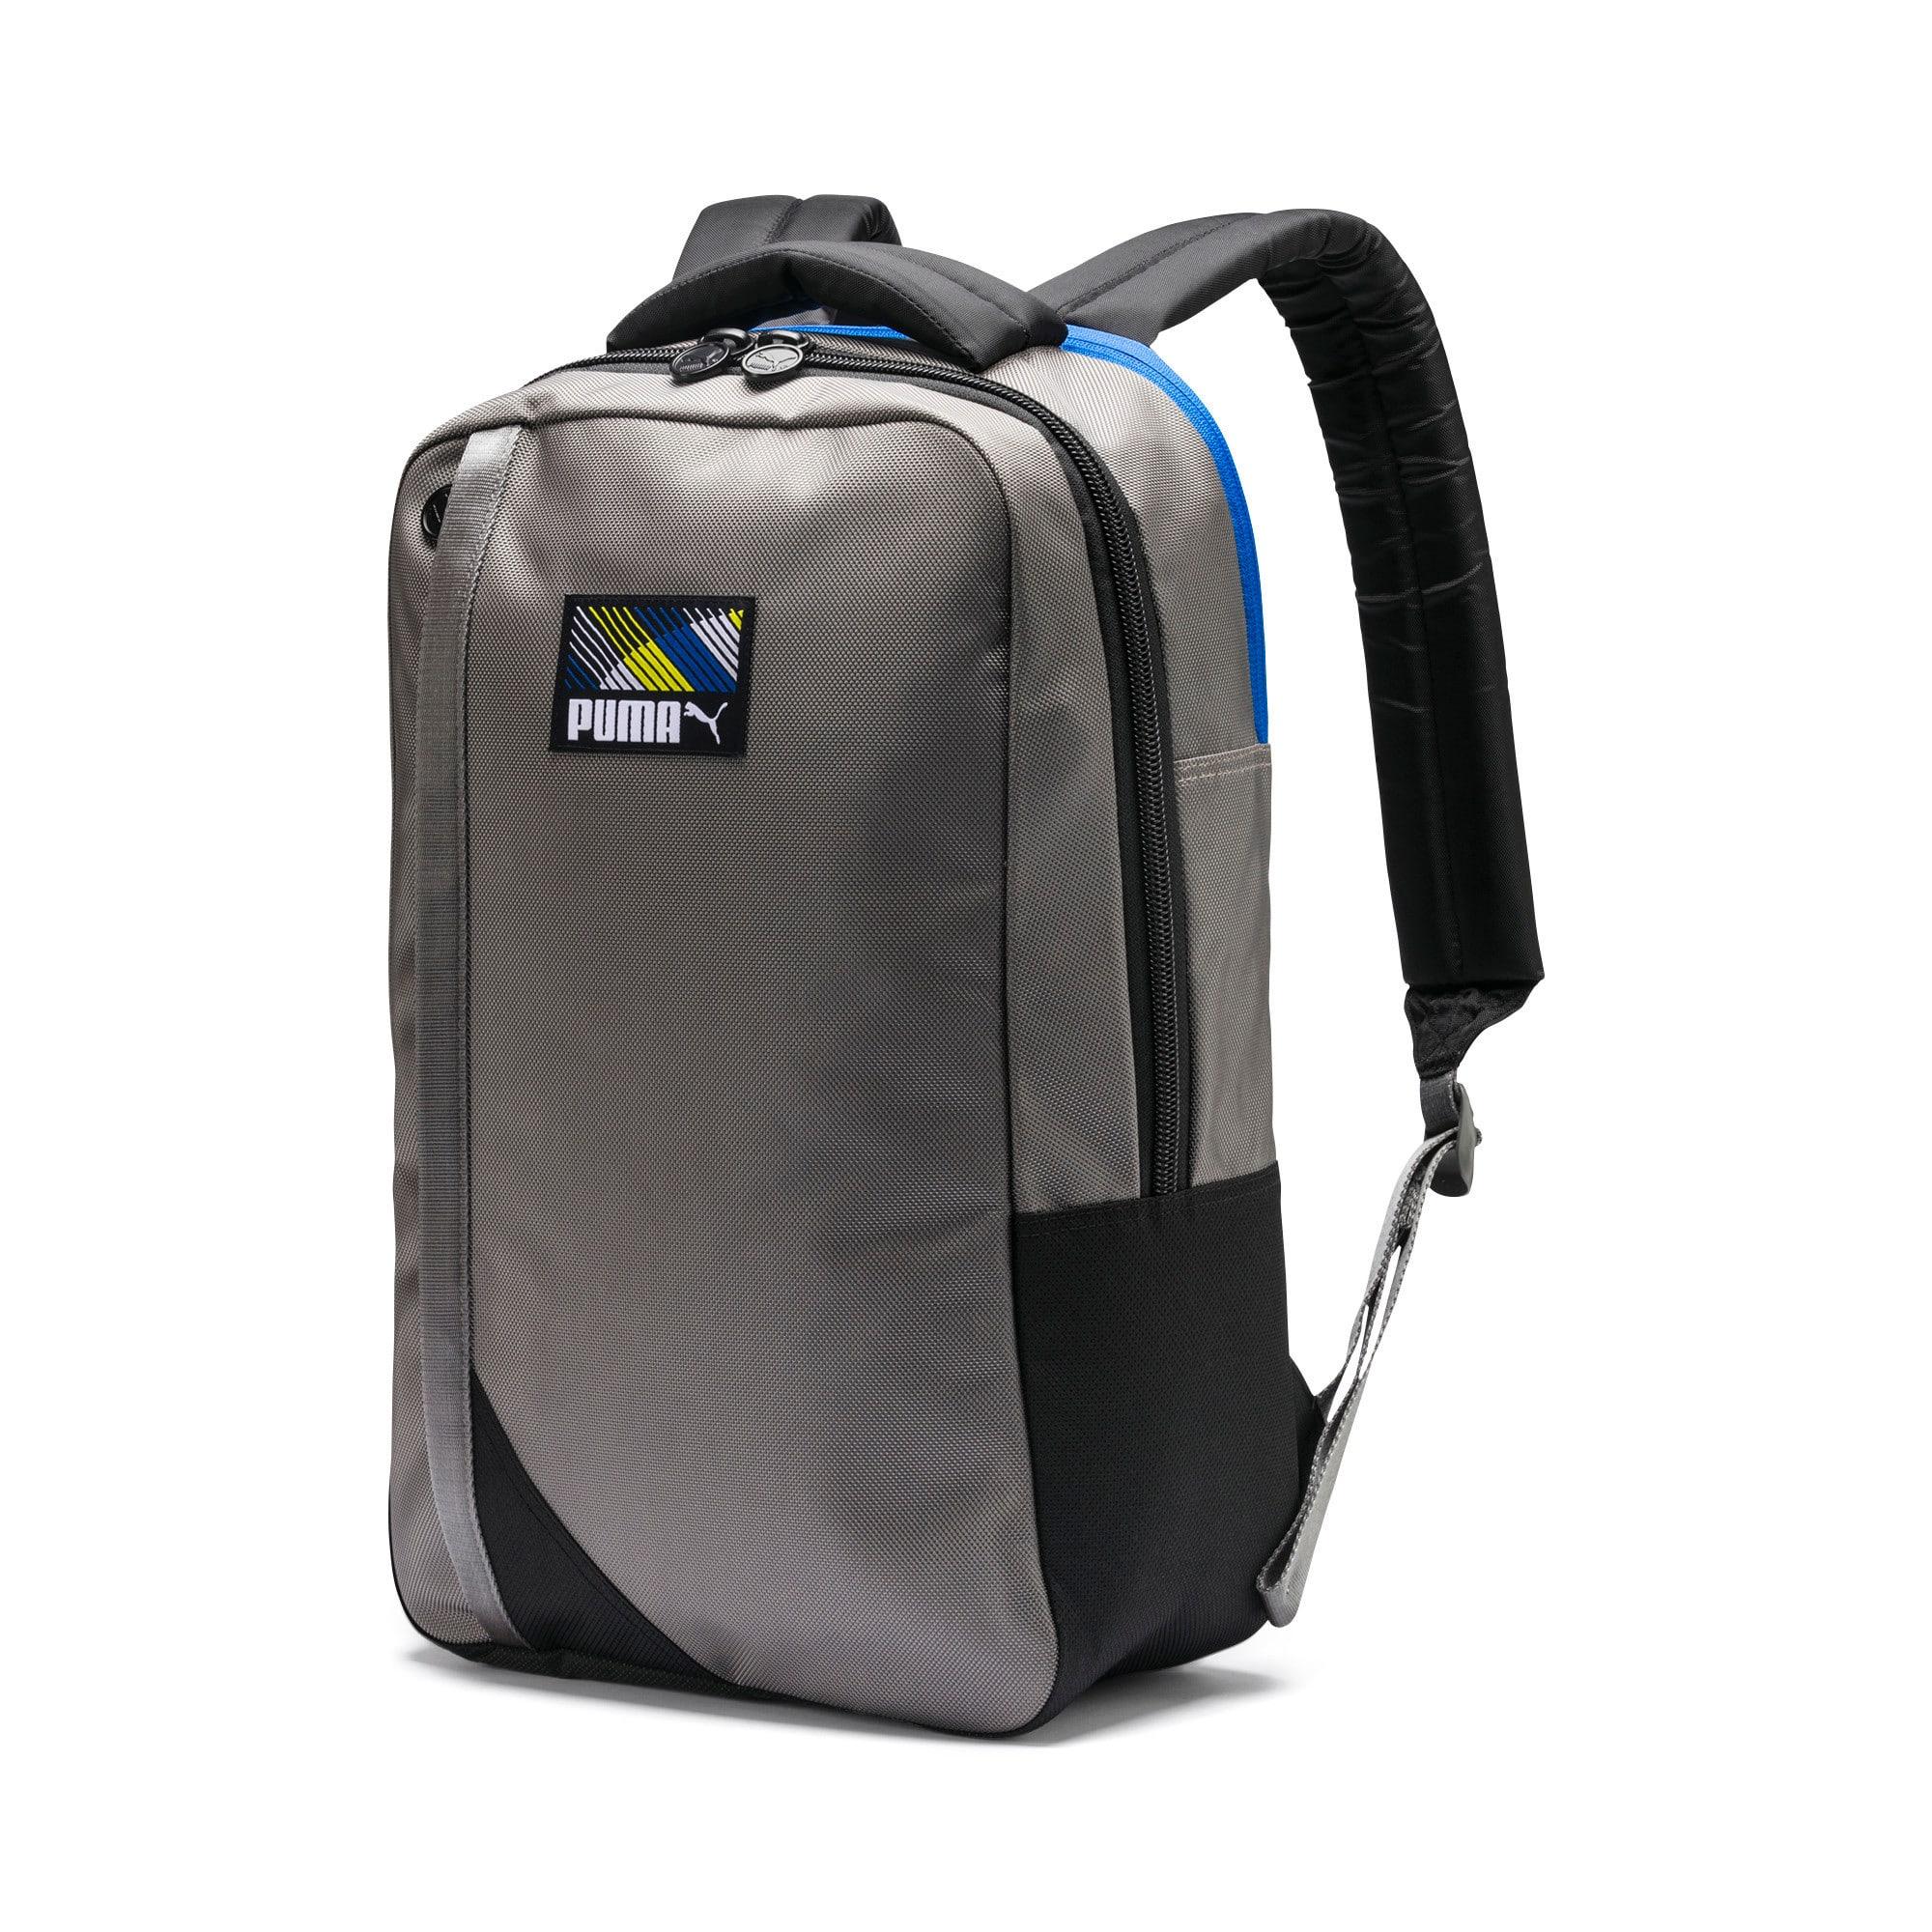 Thumbnail 1 of RS-X Backpack, Charcoal Gray, medium